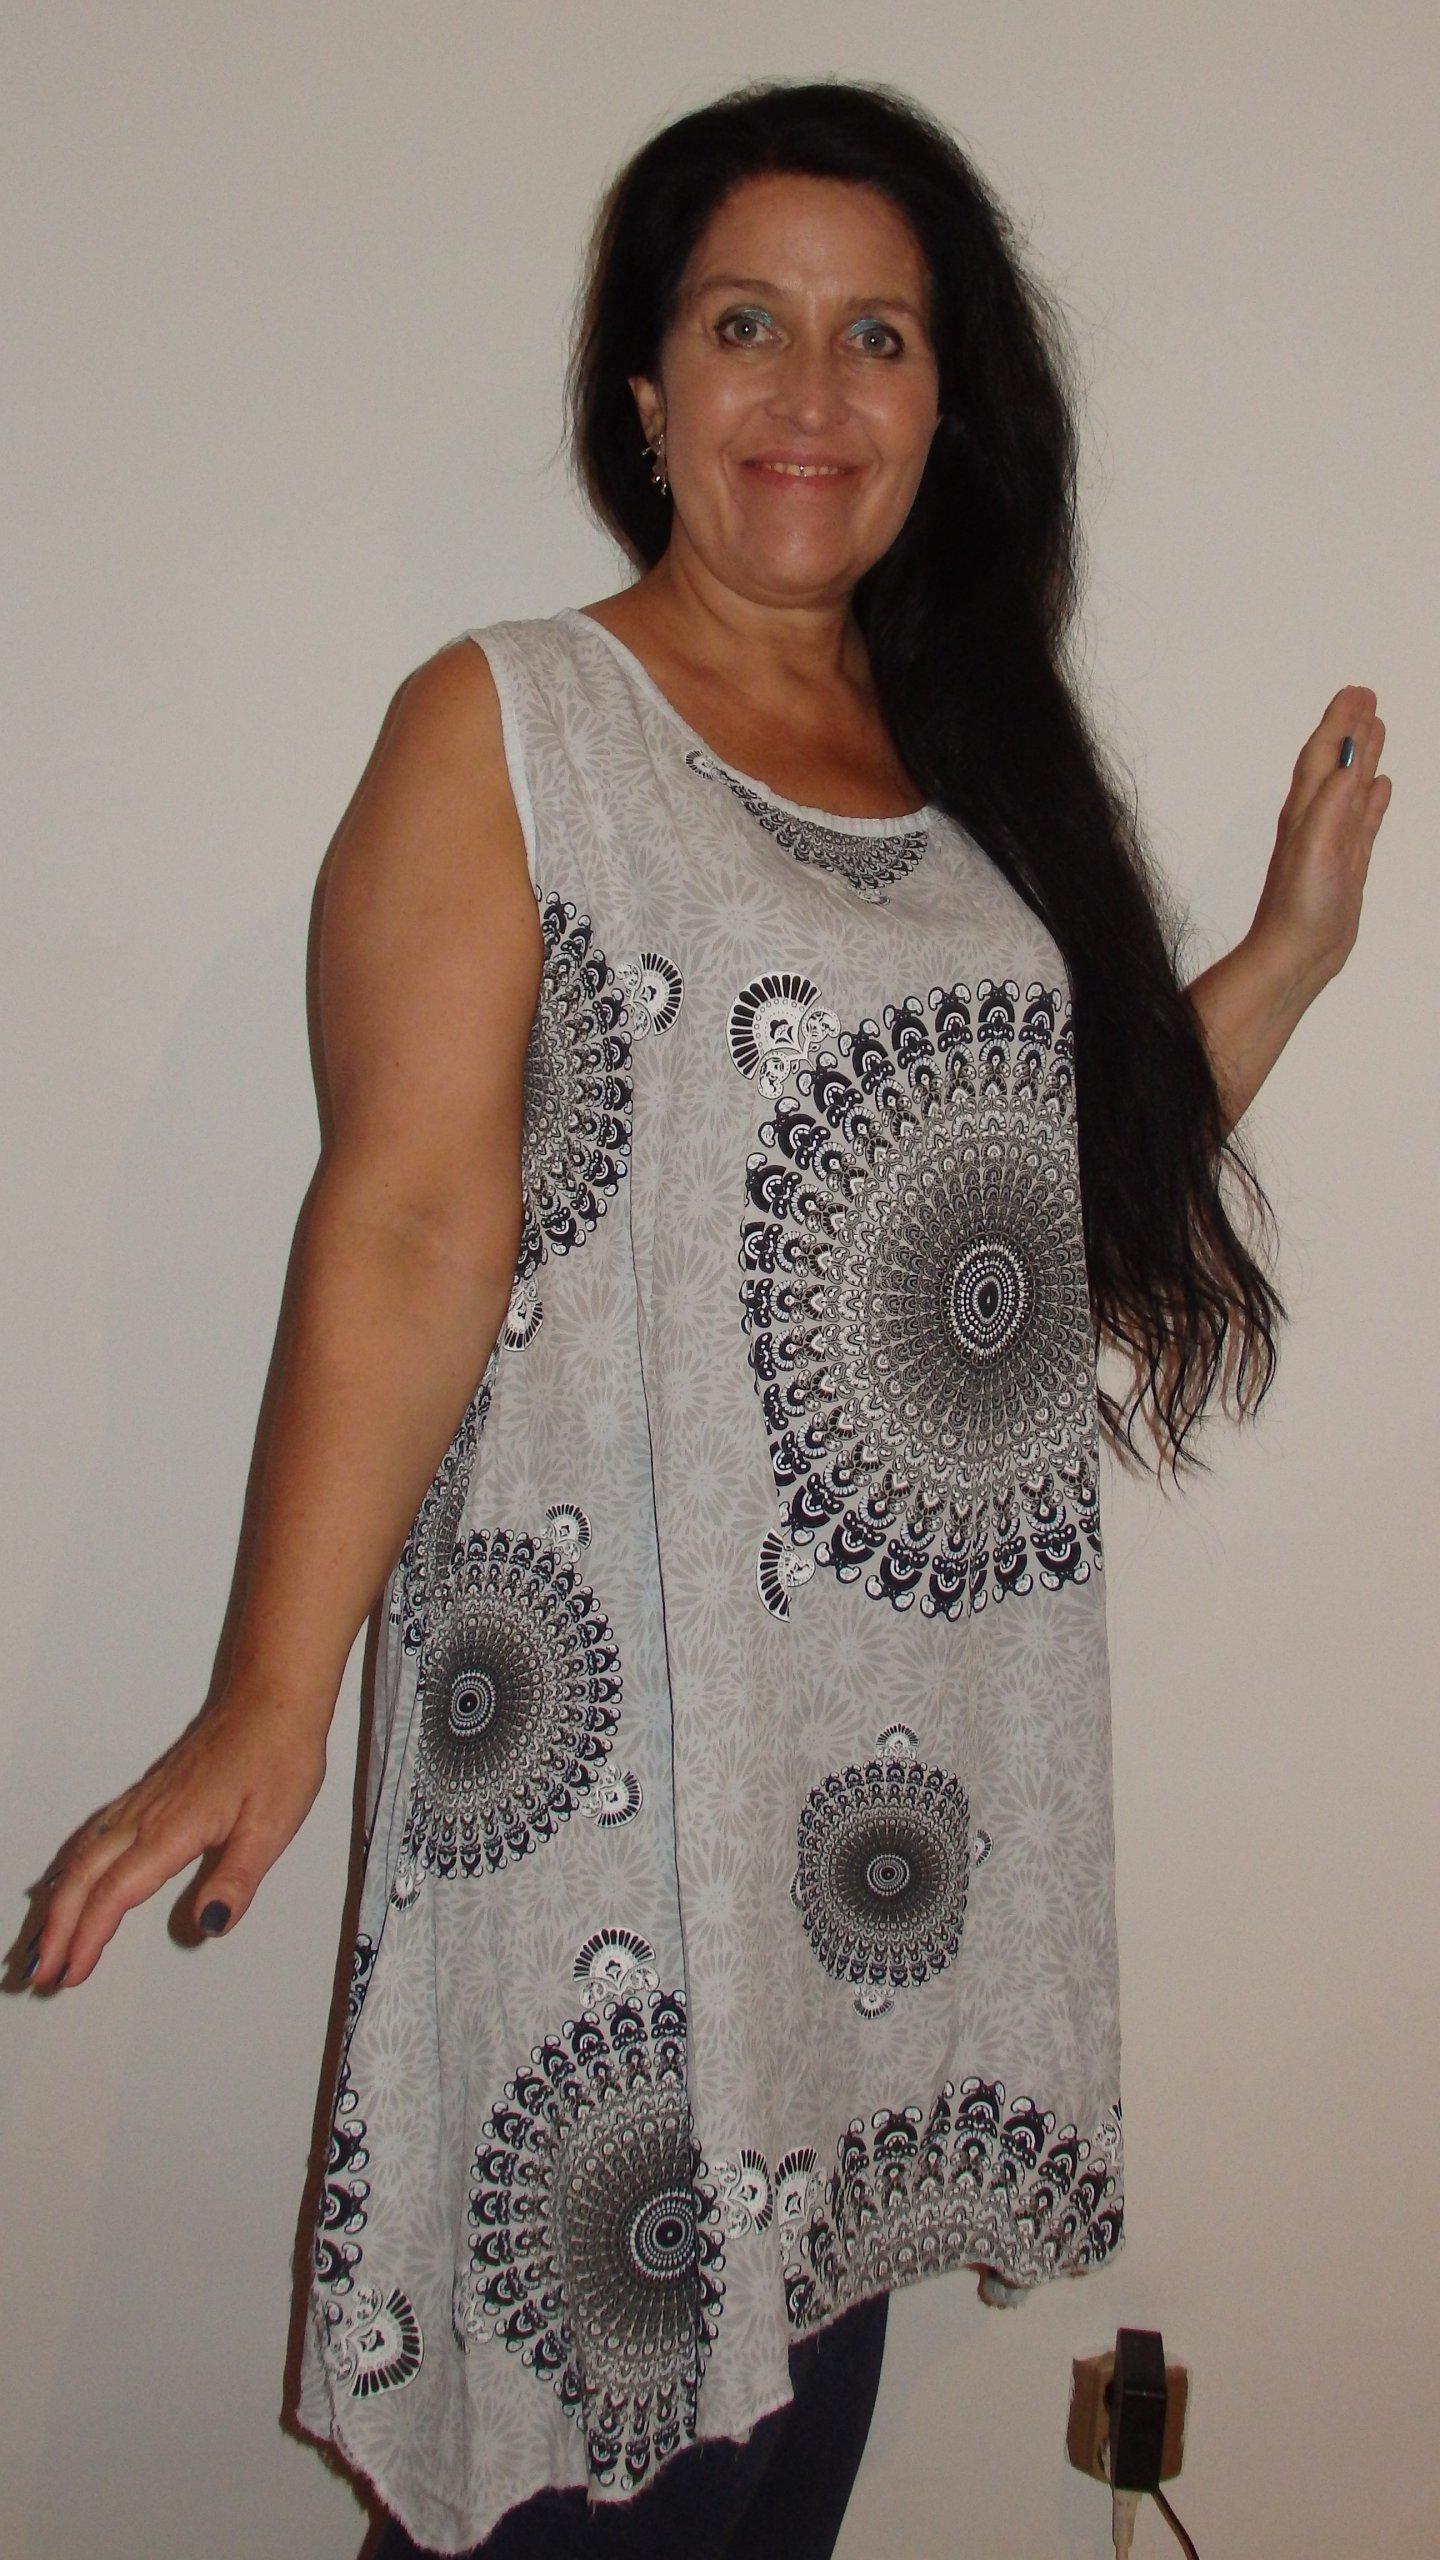 b554474f68 Cudna Sukienka Orientalna z Ażurem 42 44 46 48 50 - 7413834518 ...